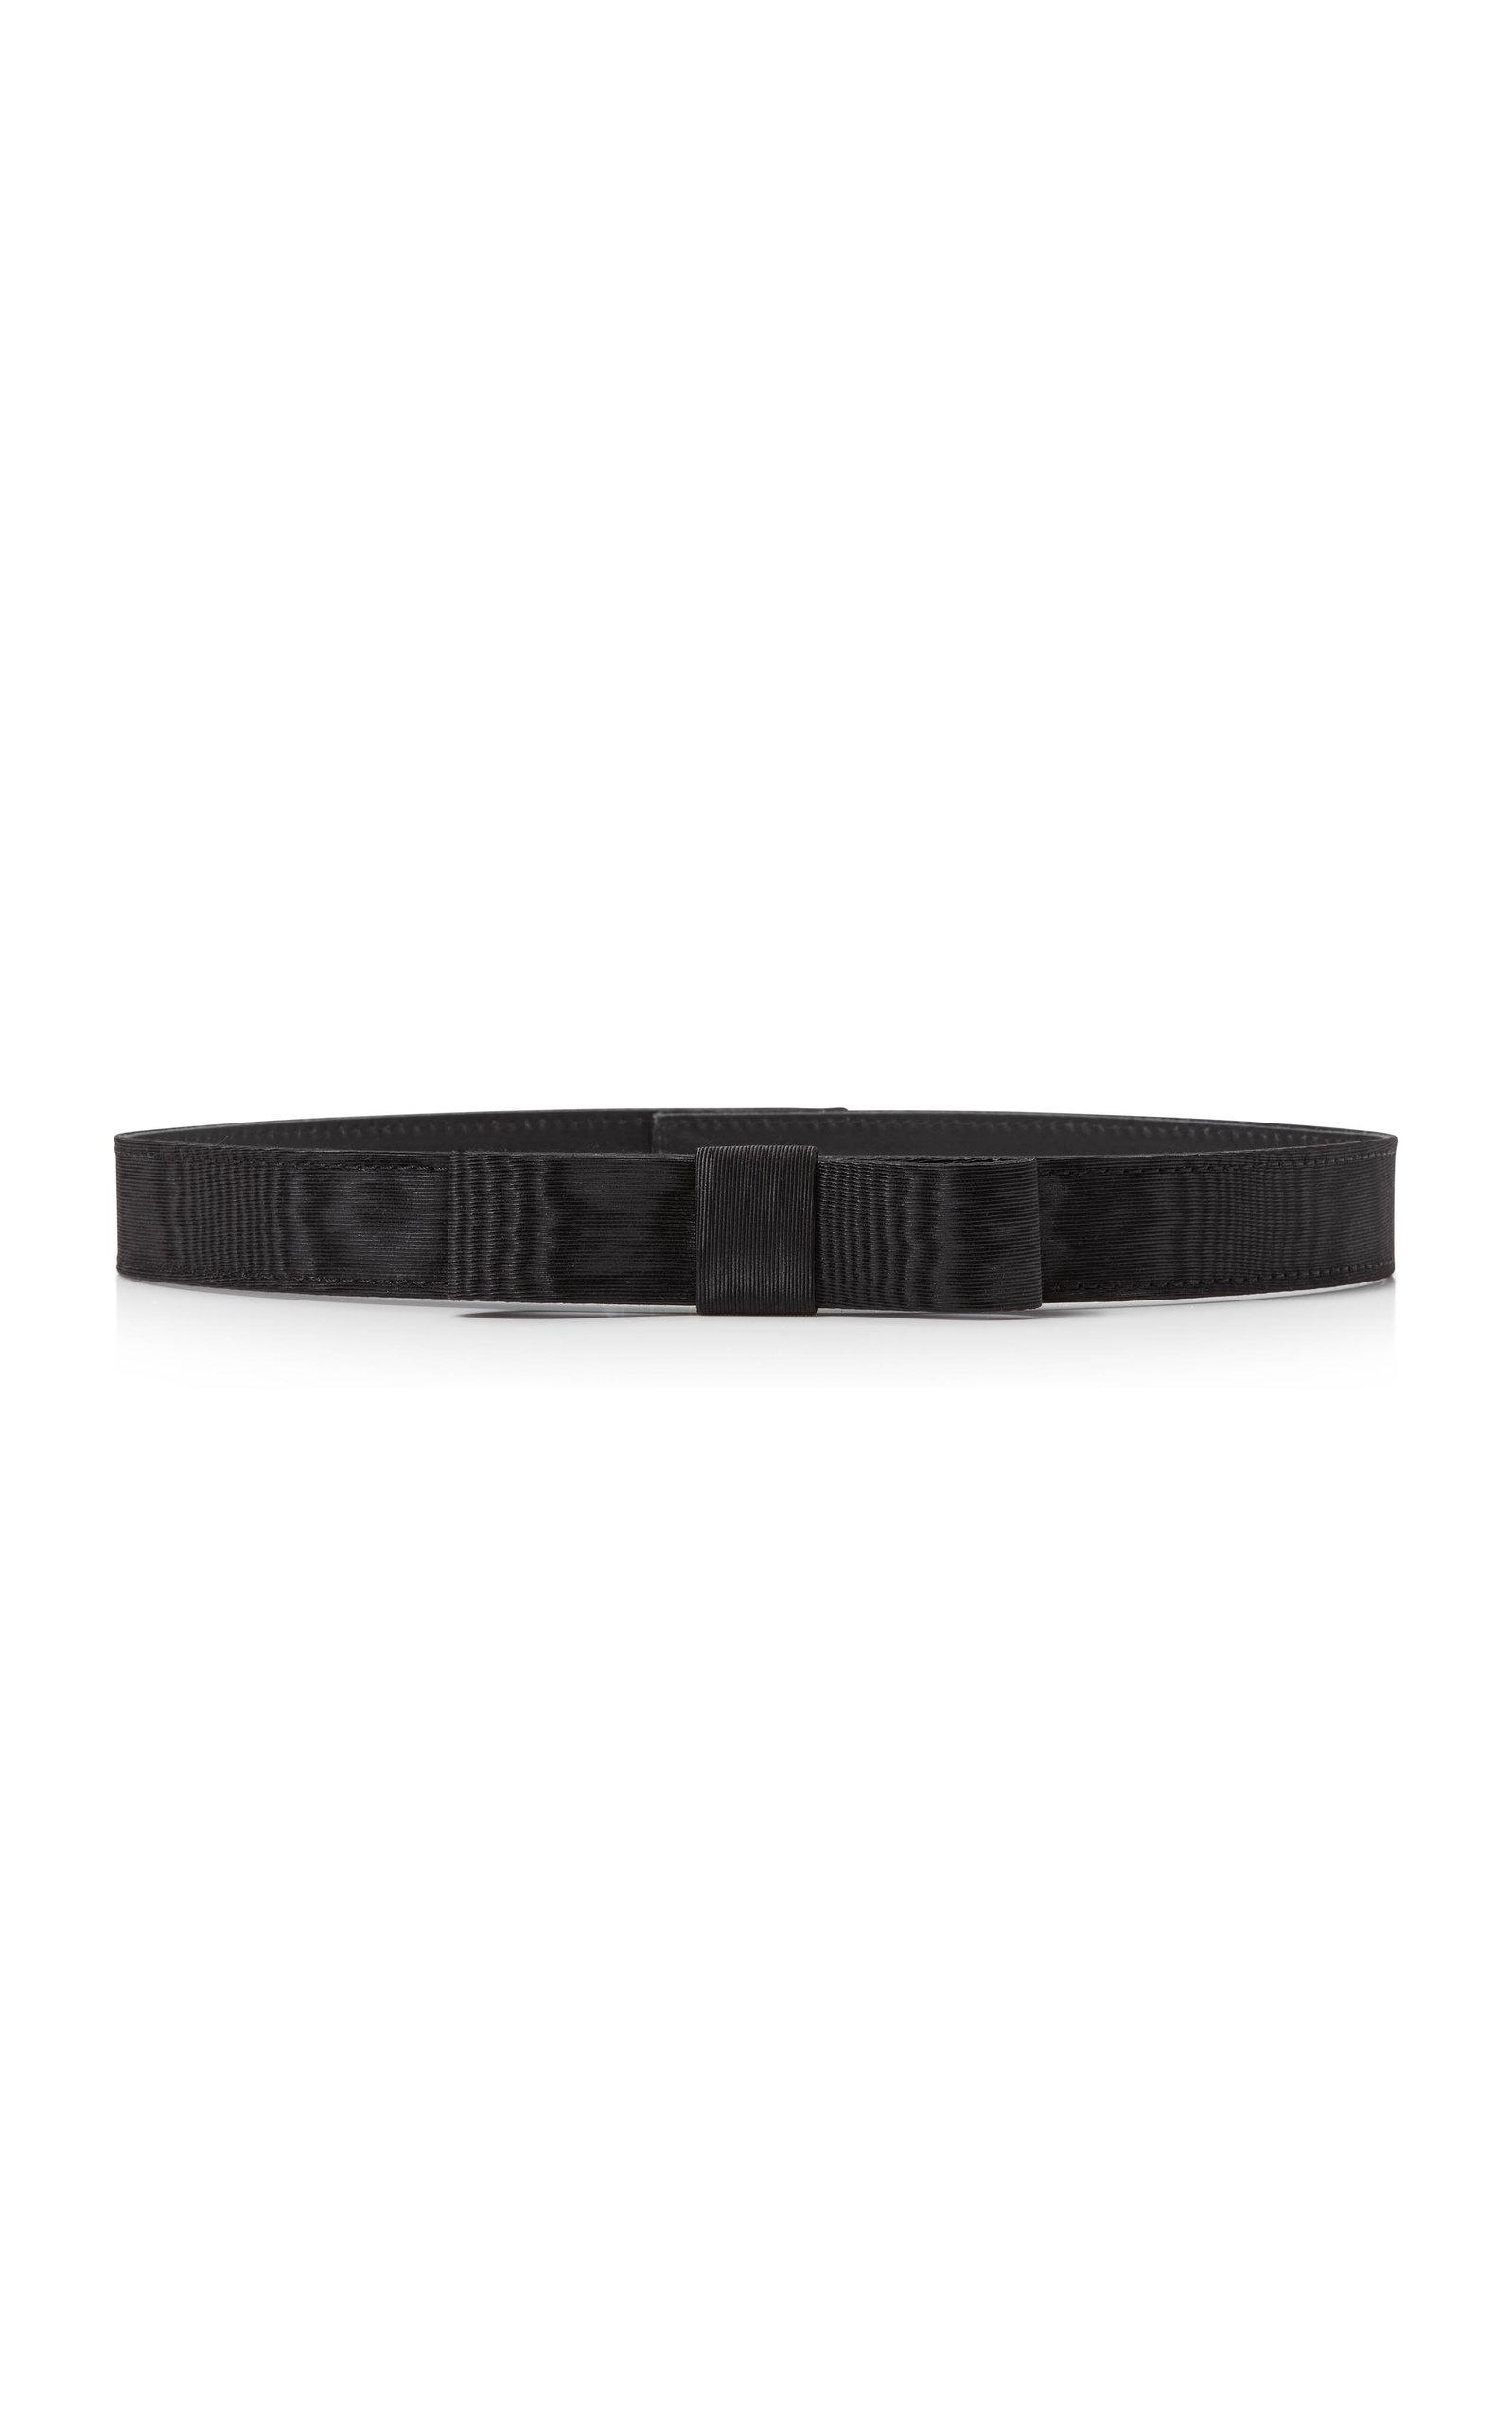 Women's Bow-Accented Moire Skinny Waist Belt